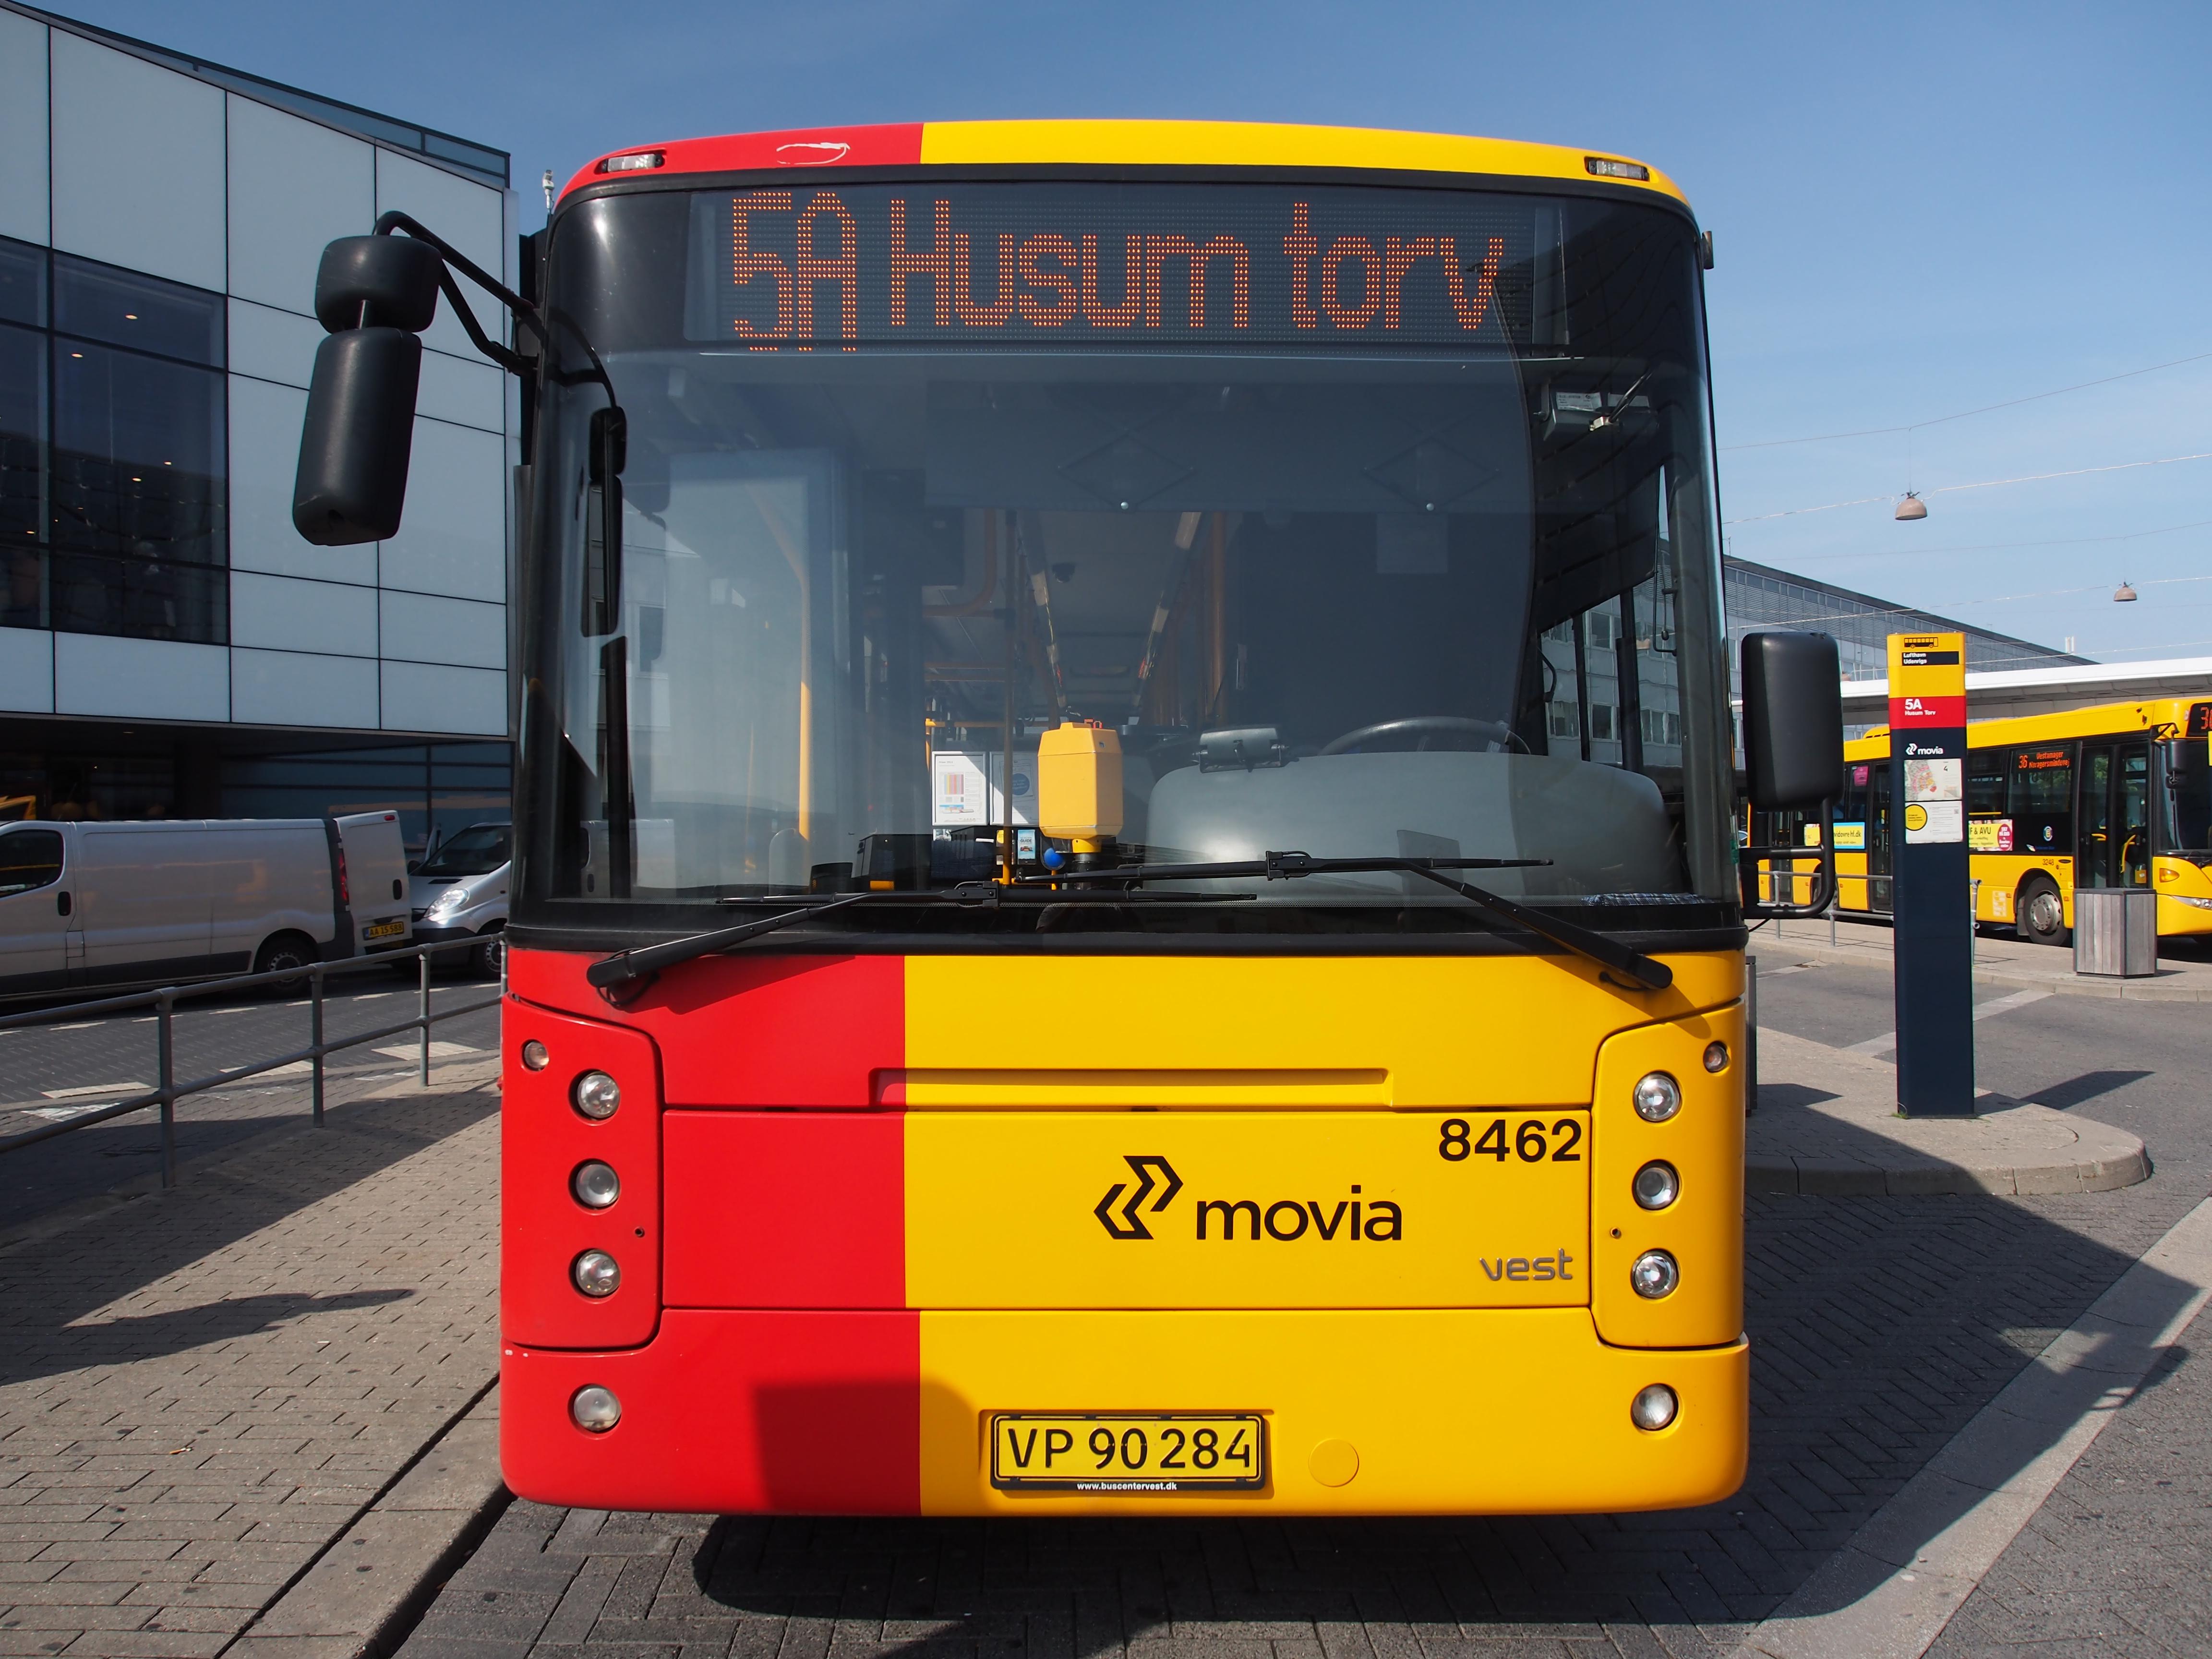 File:Vest Movia bus 8462 line 5A.JPG